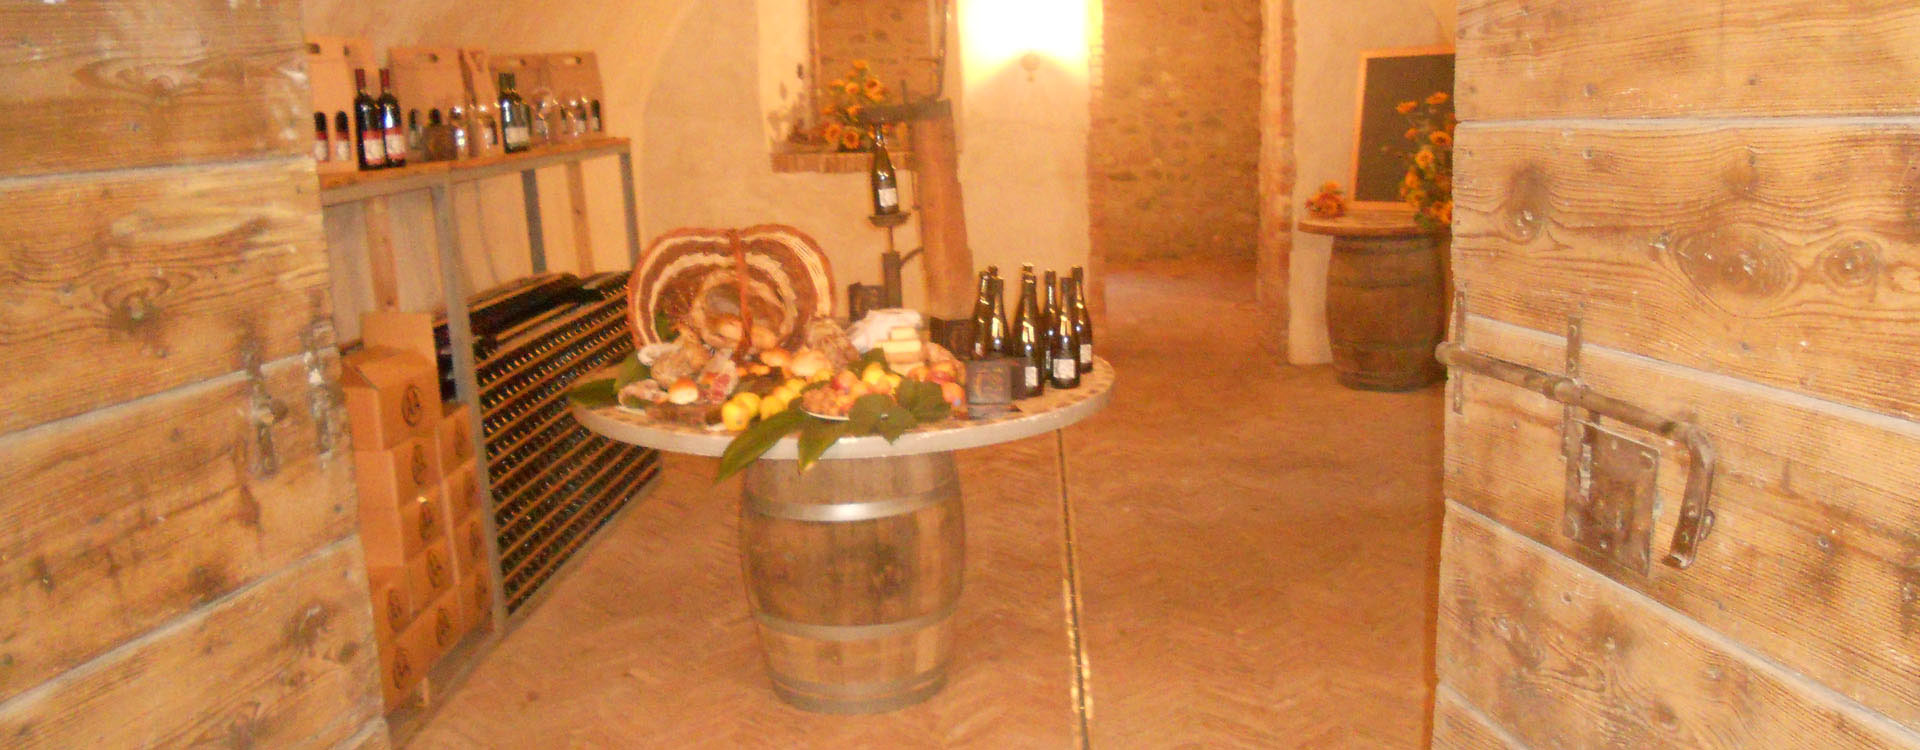 Cantina Antica Volta Ambrosini<br> Expo 2015